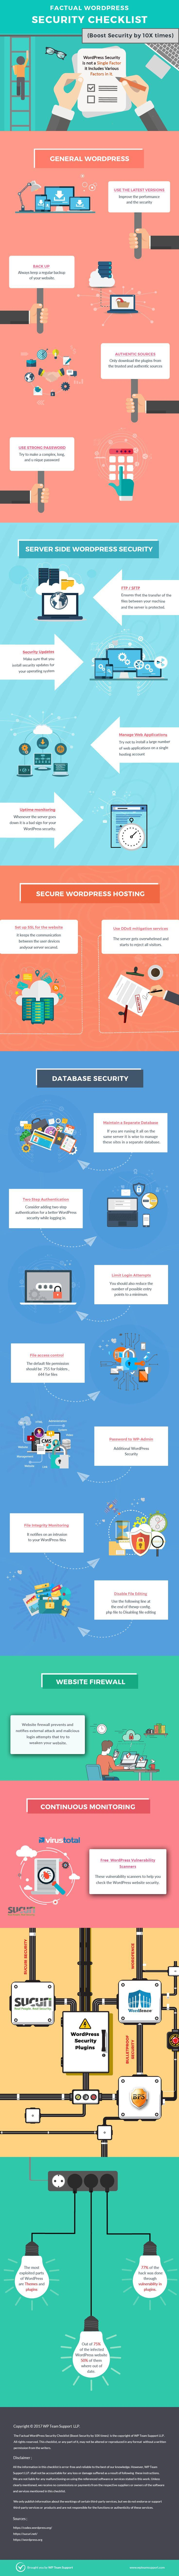 Factual WordPress Security Checklist